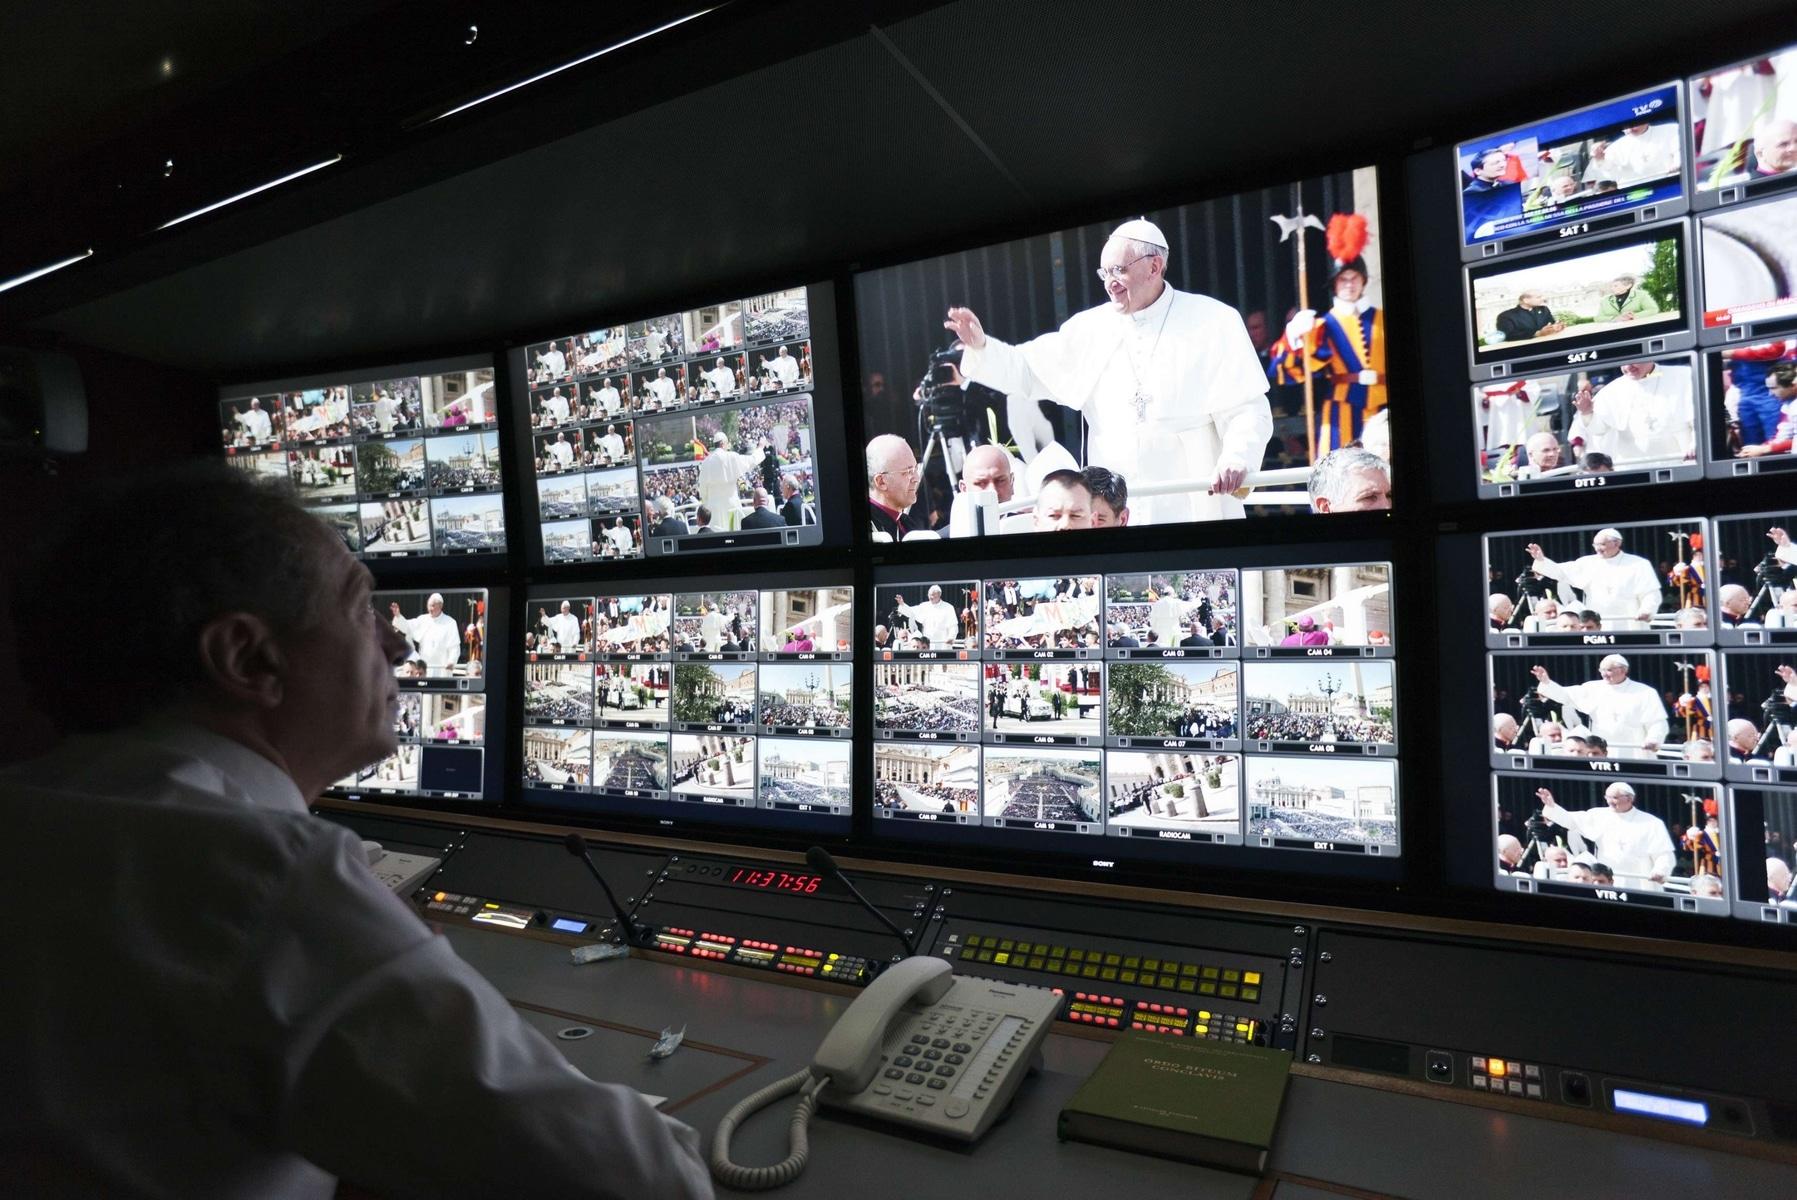 Centro Televisivo Vaticano - Fuente: Infovaticana.com